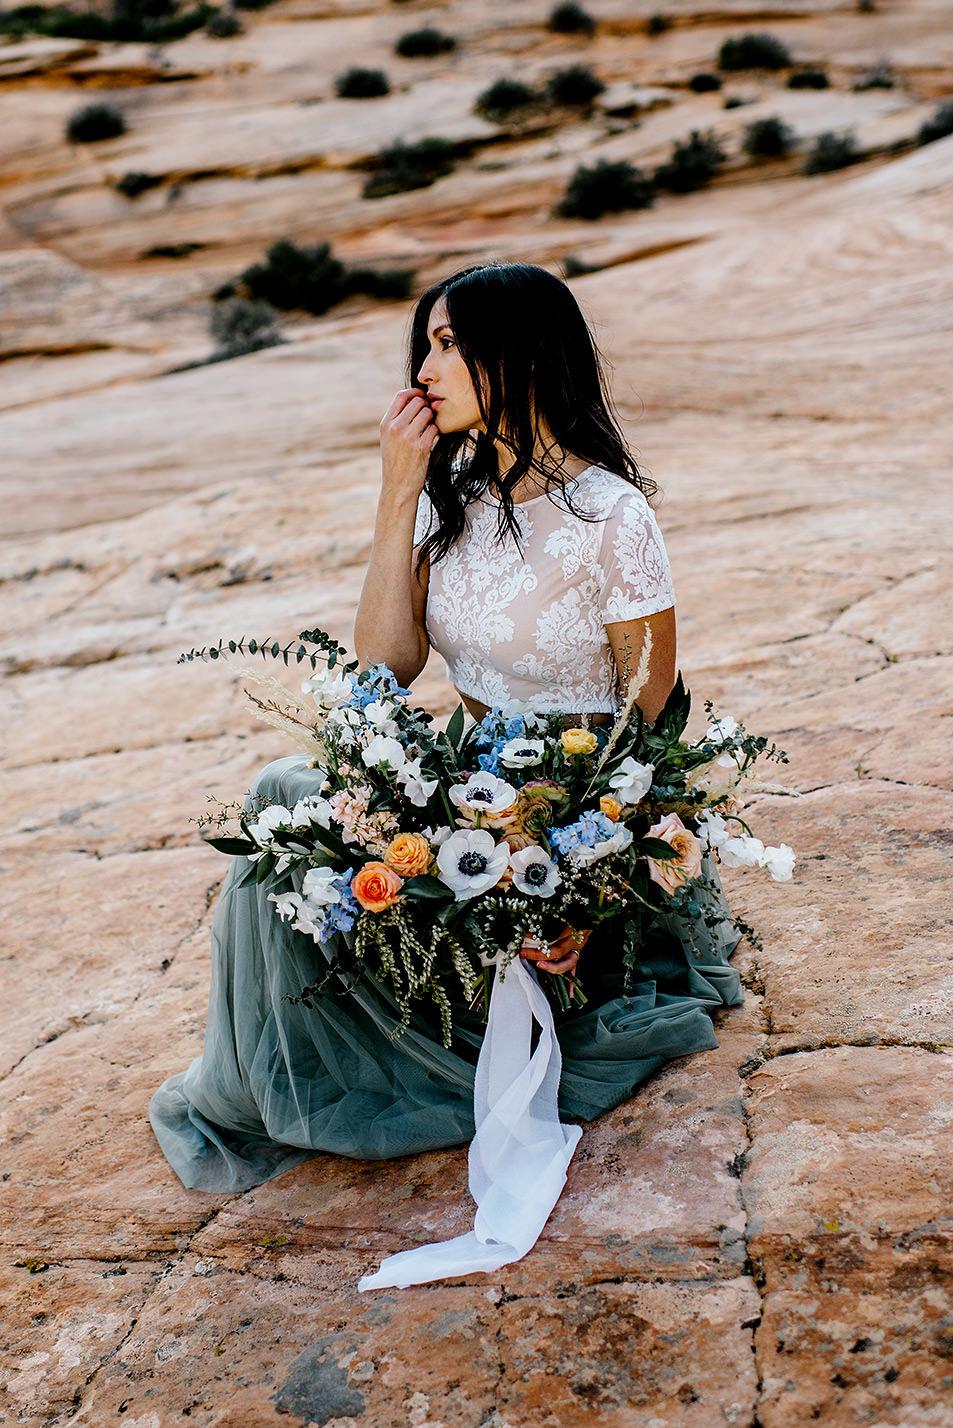 Zion_National_Park_Arizona_Wedding_Photographer_005.jpg